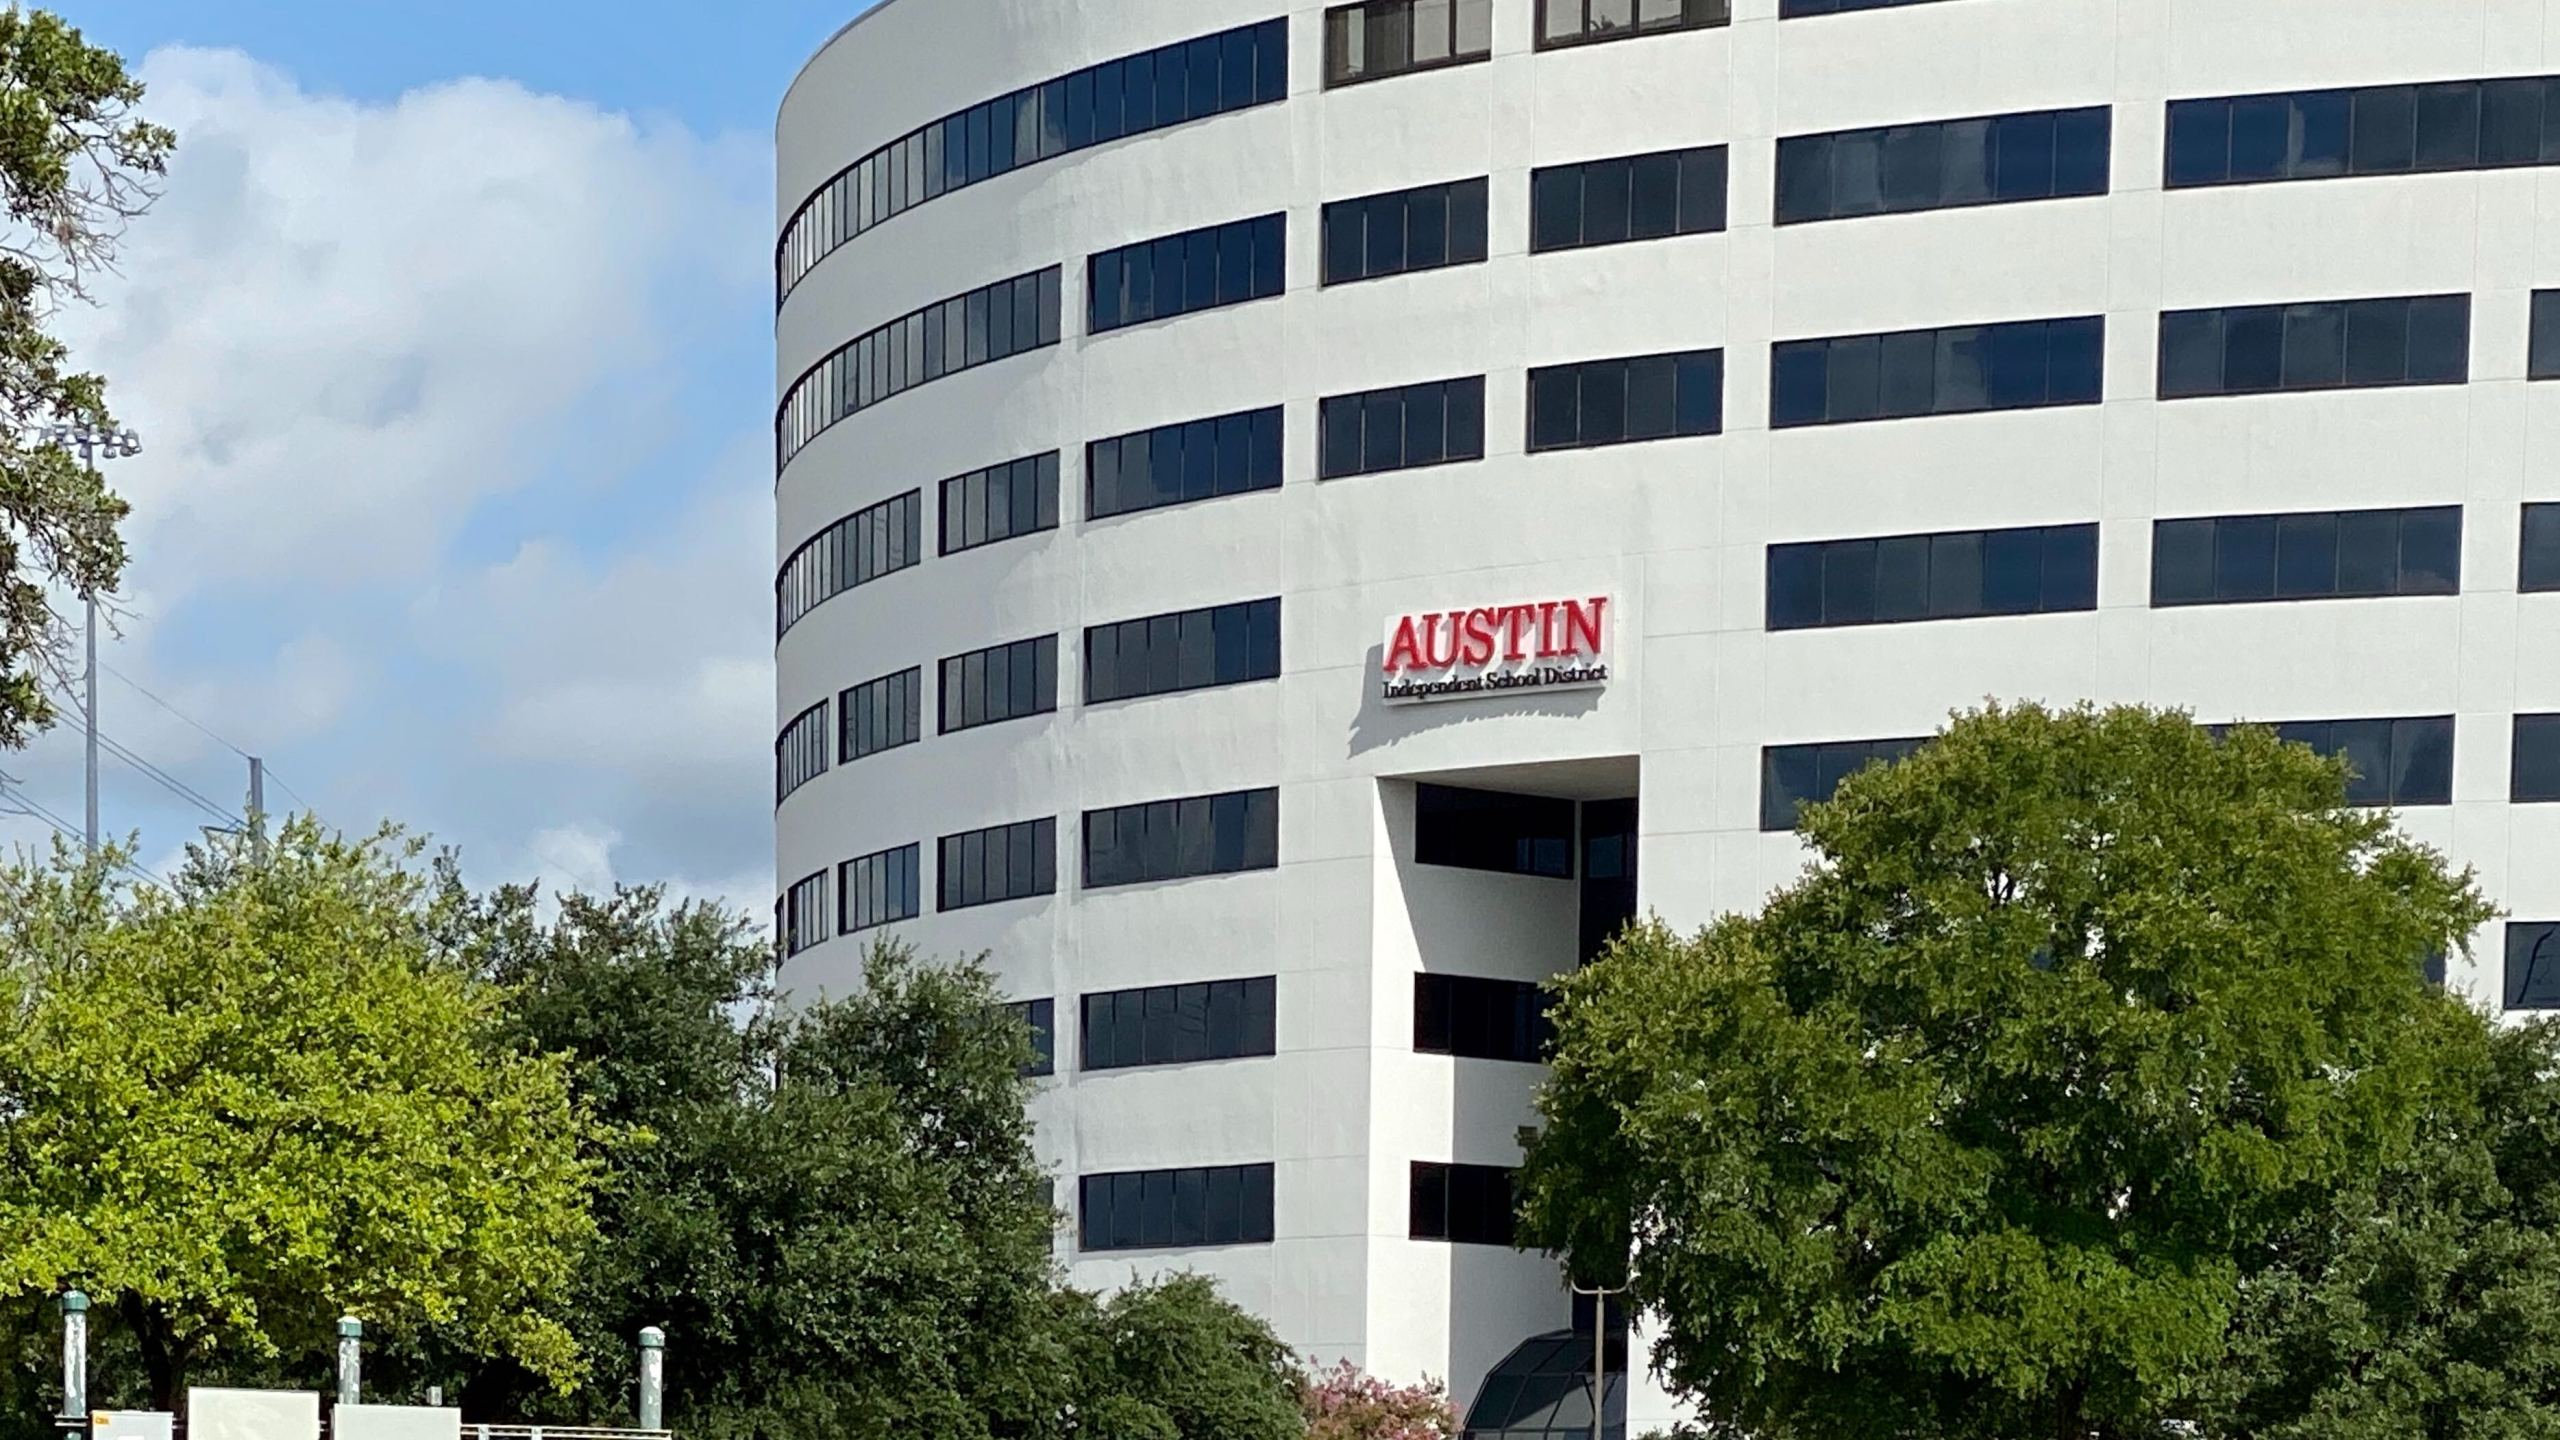 Austin ISD Headquarters (Picture: KXAN/Alex Hoder)